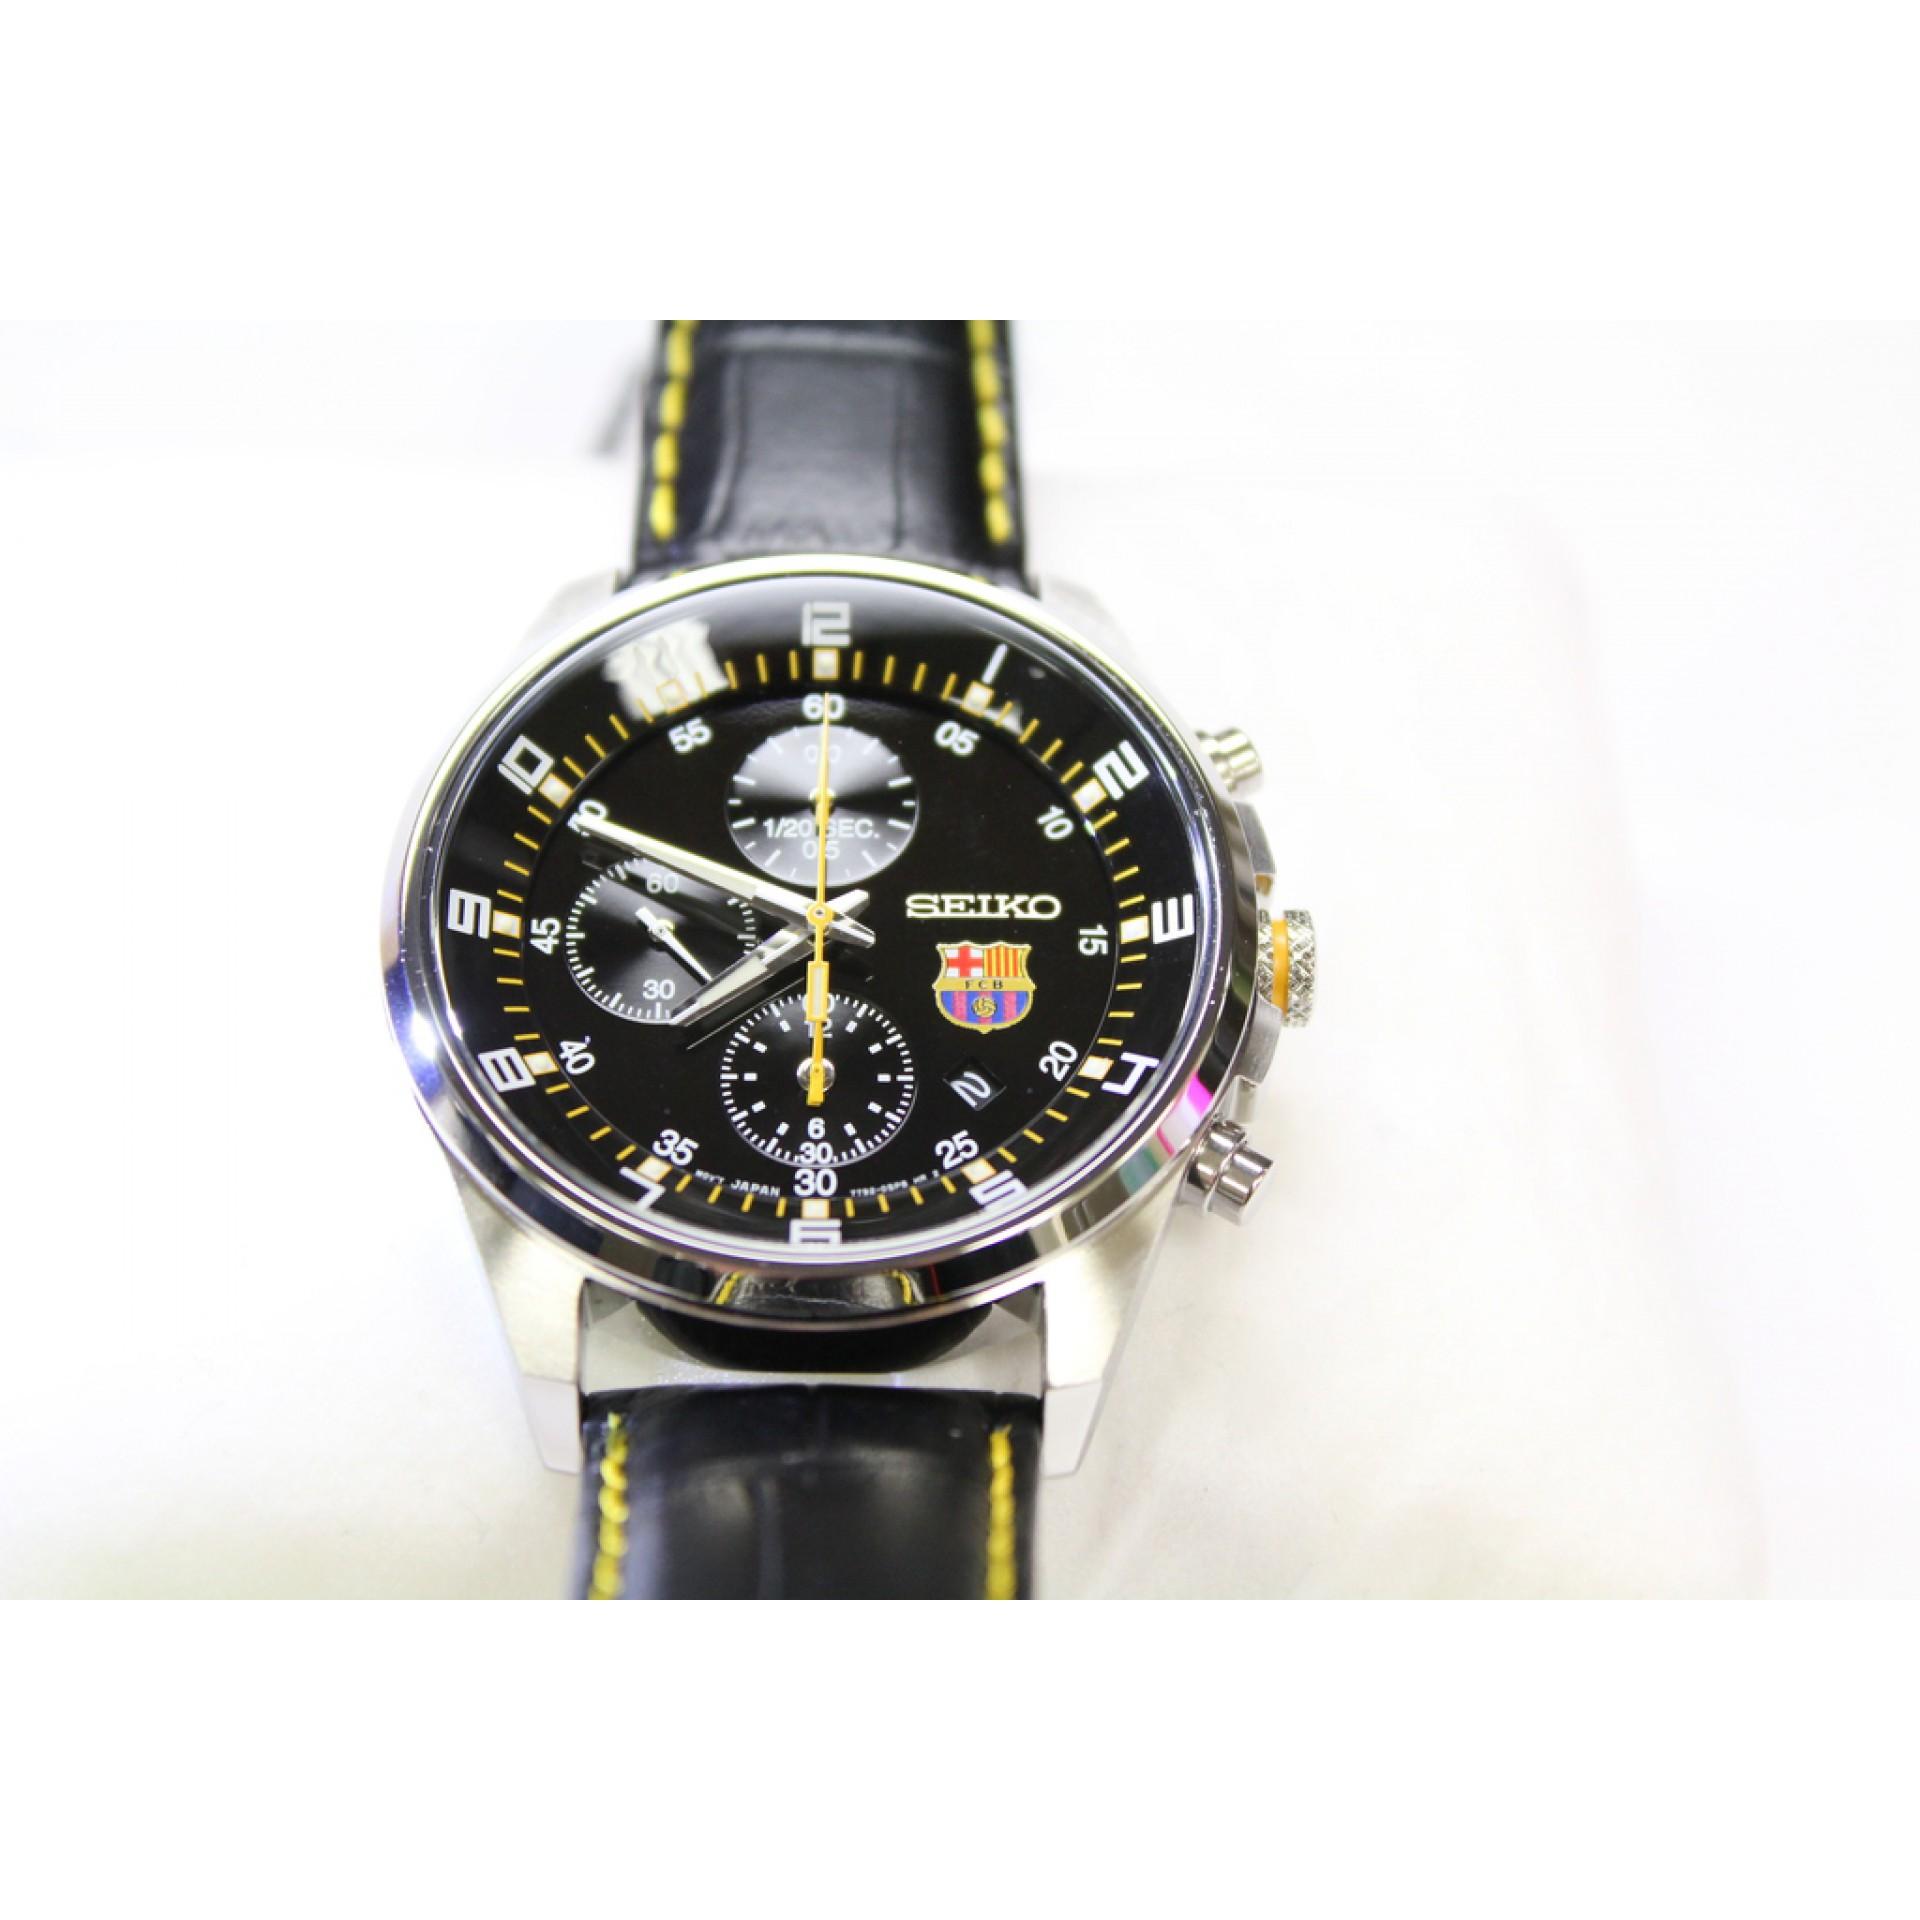 Seiko Chronograph F.C. Barcelona Mens Watch (SNDD25P1) 976336f080